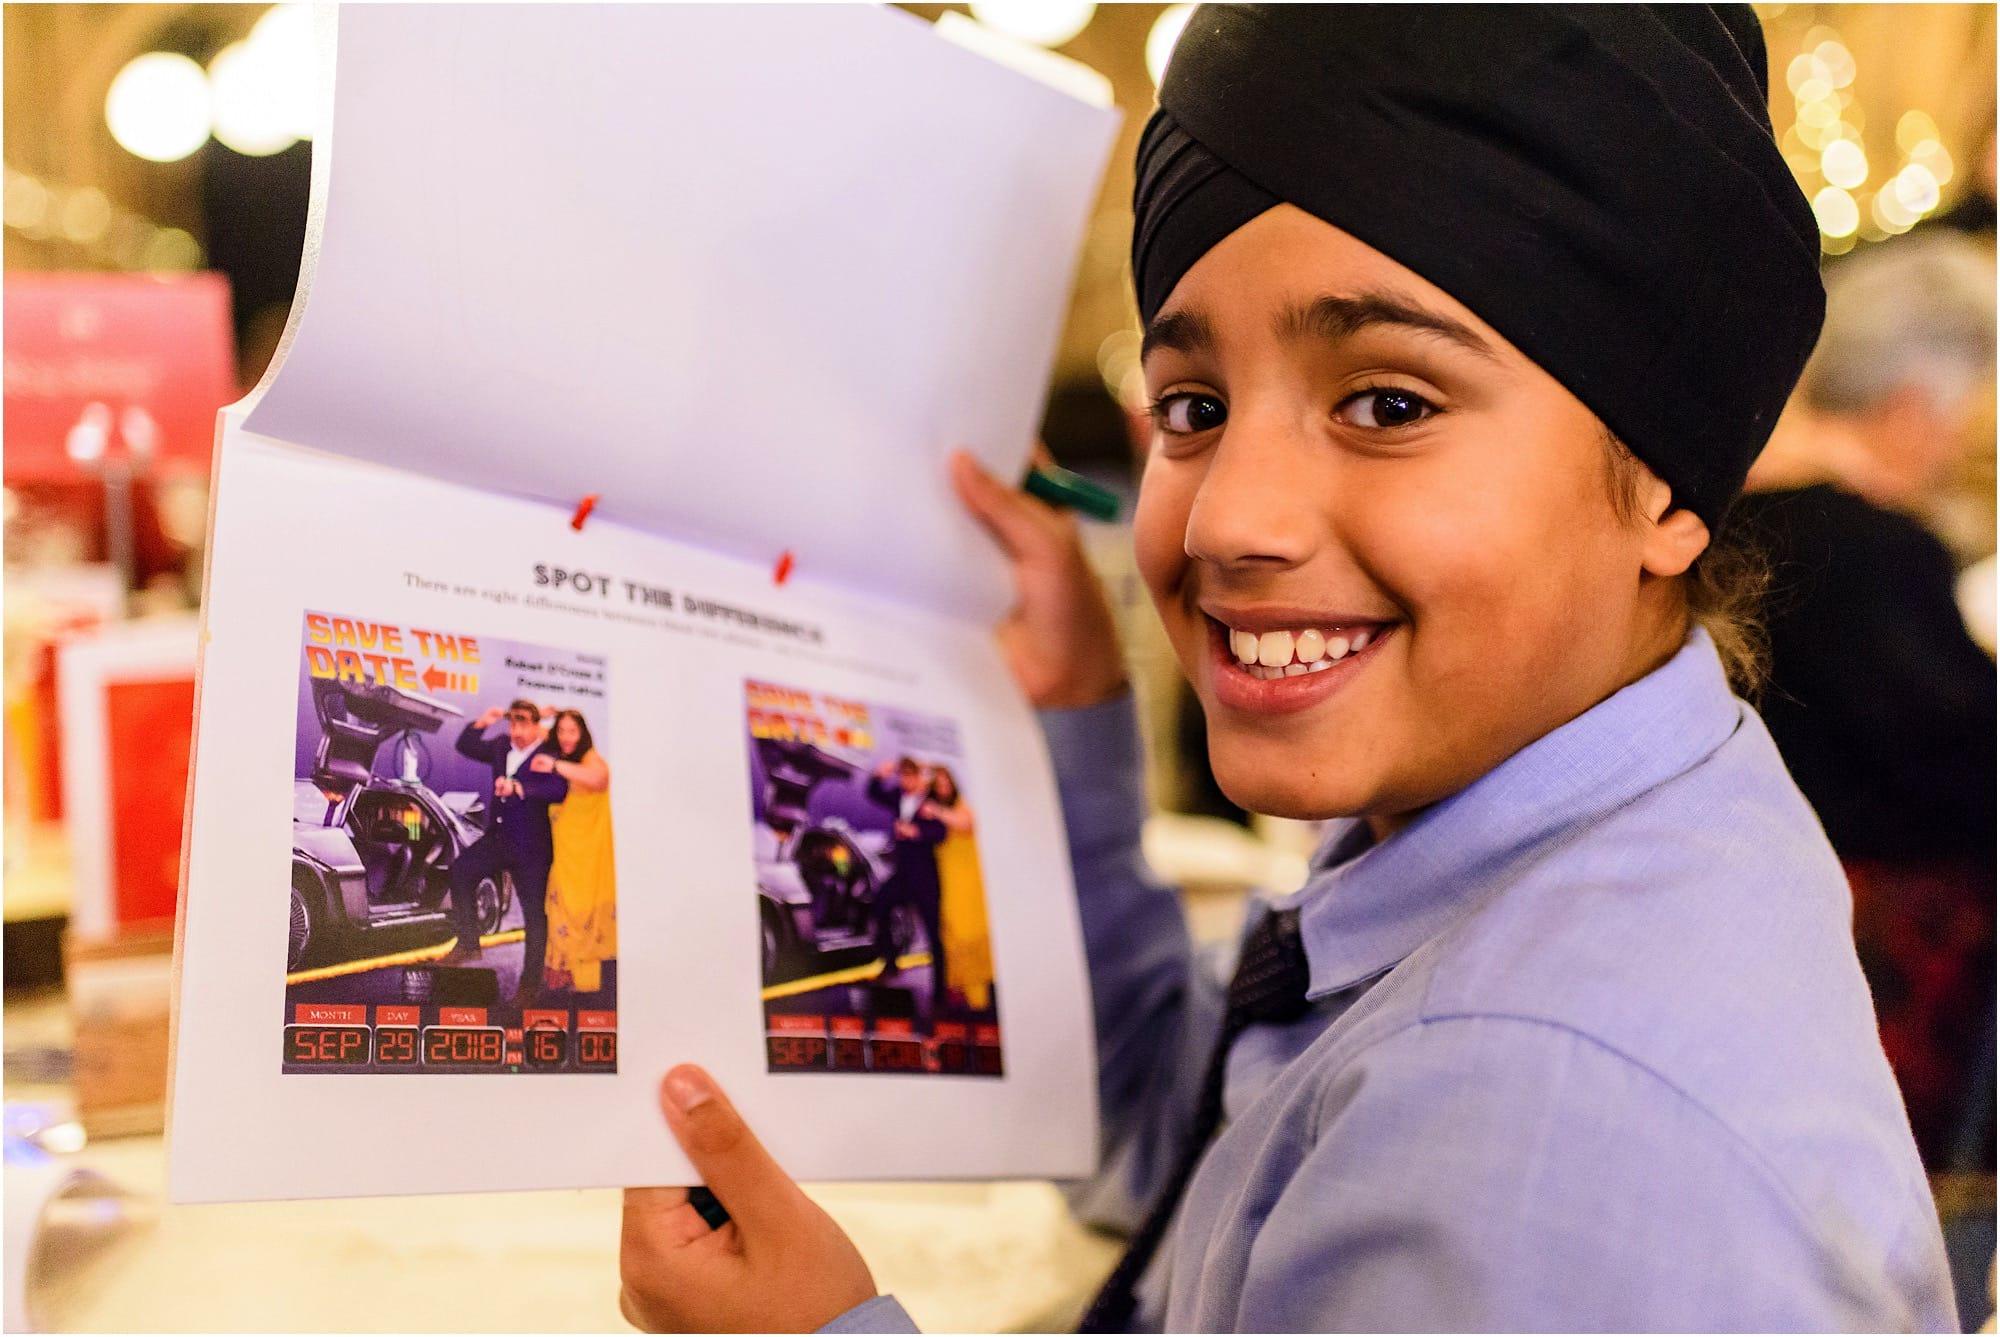 Kid in turban happy with his menu